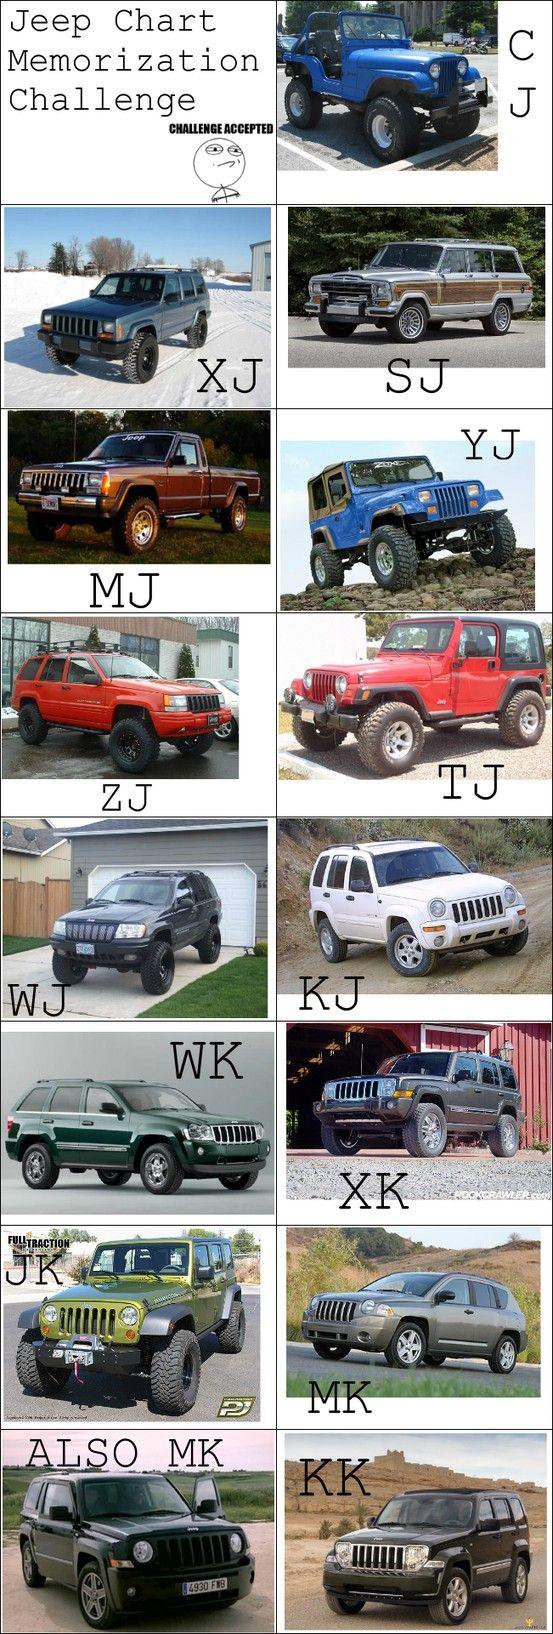 Jeep body type chart jeep memorization challenge